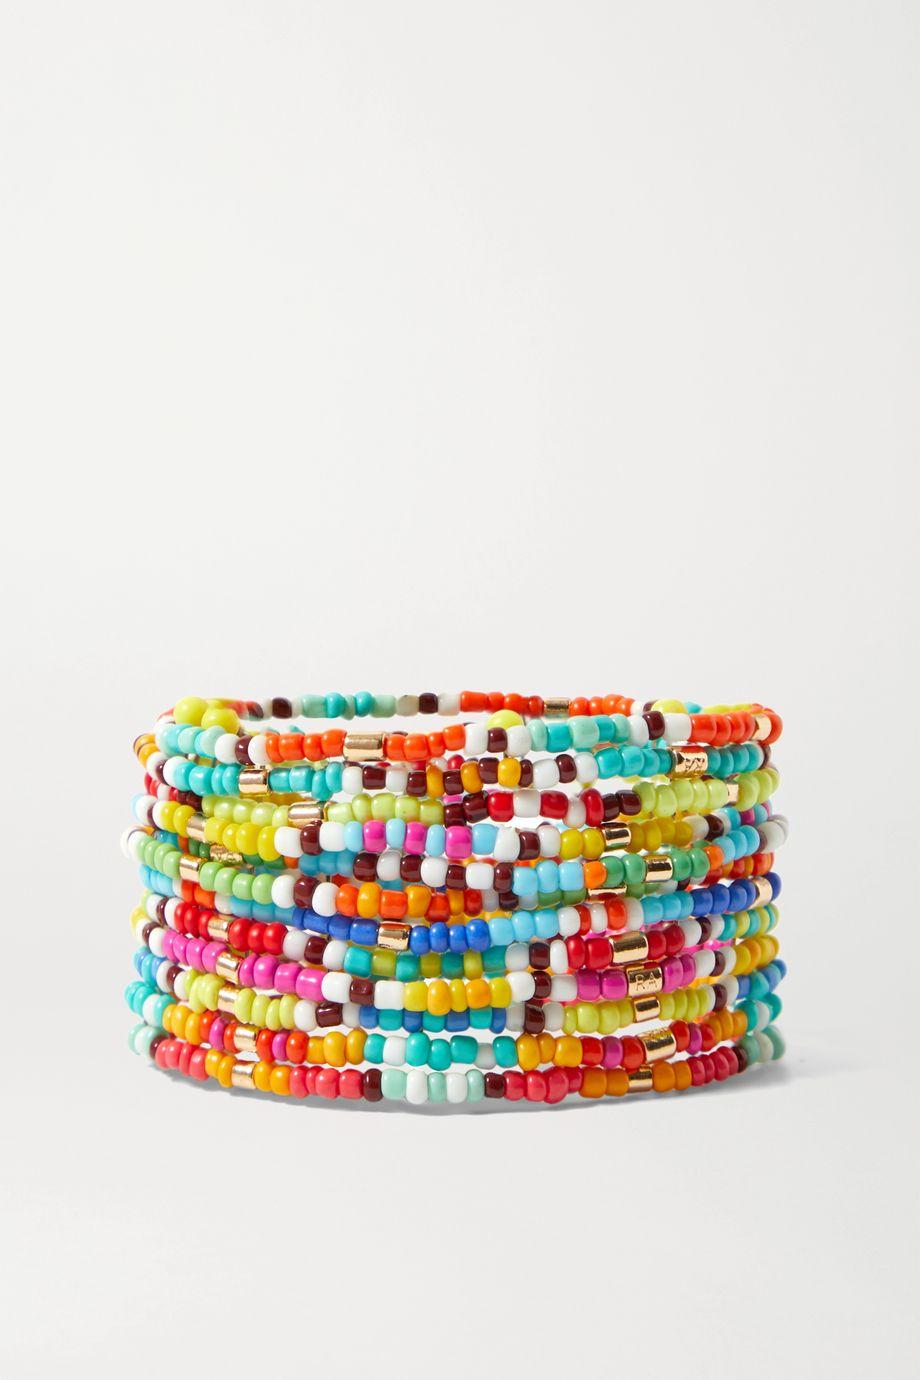 Roxanne Assoulin New Patchwork Set aus zwölf Armbändern mit Zierperlen